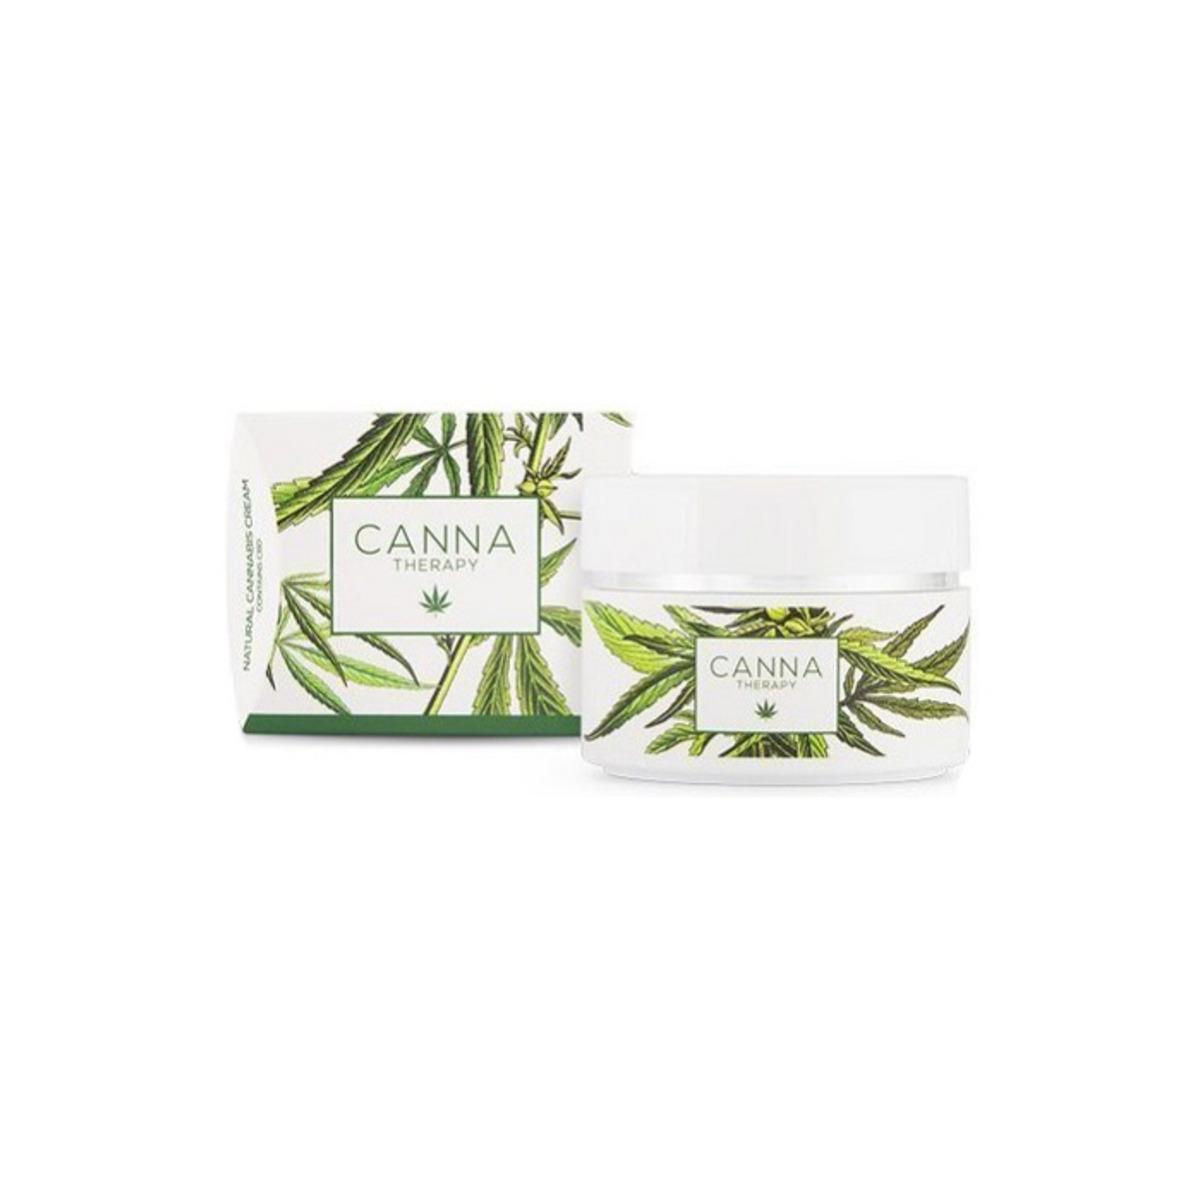 Canna Therapy крем за лице, 50 мл